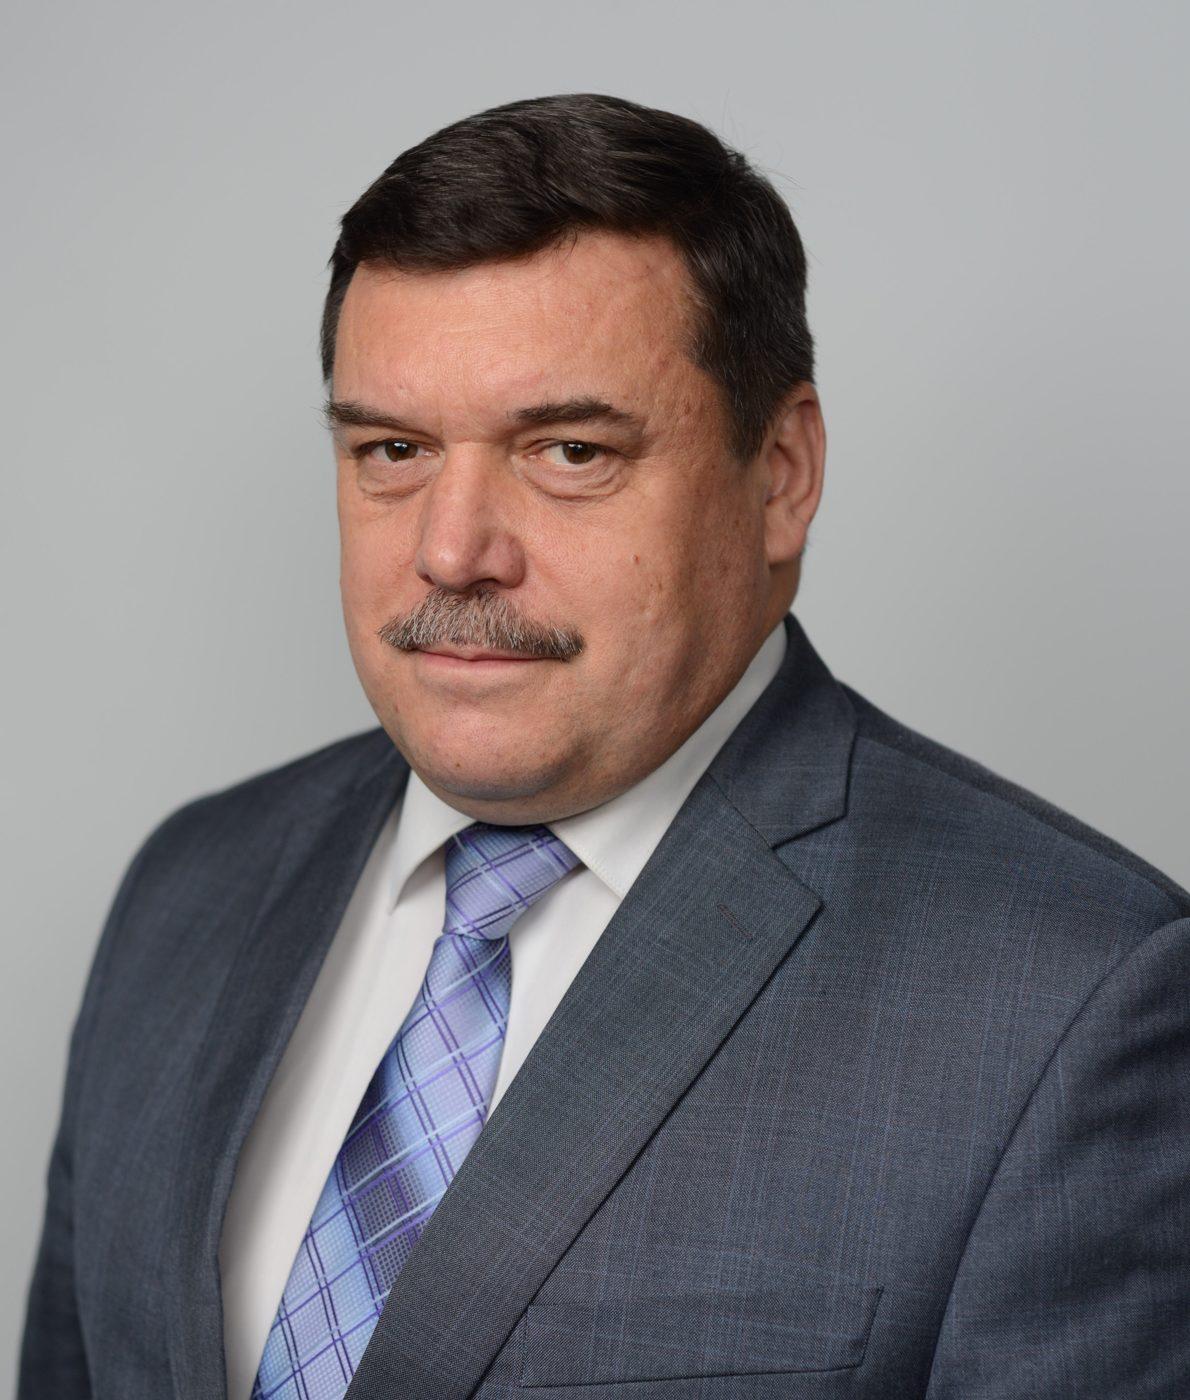 Коршунов Александр Юрьевич